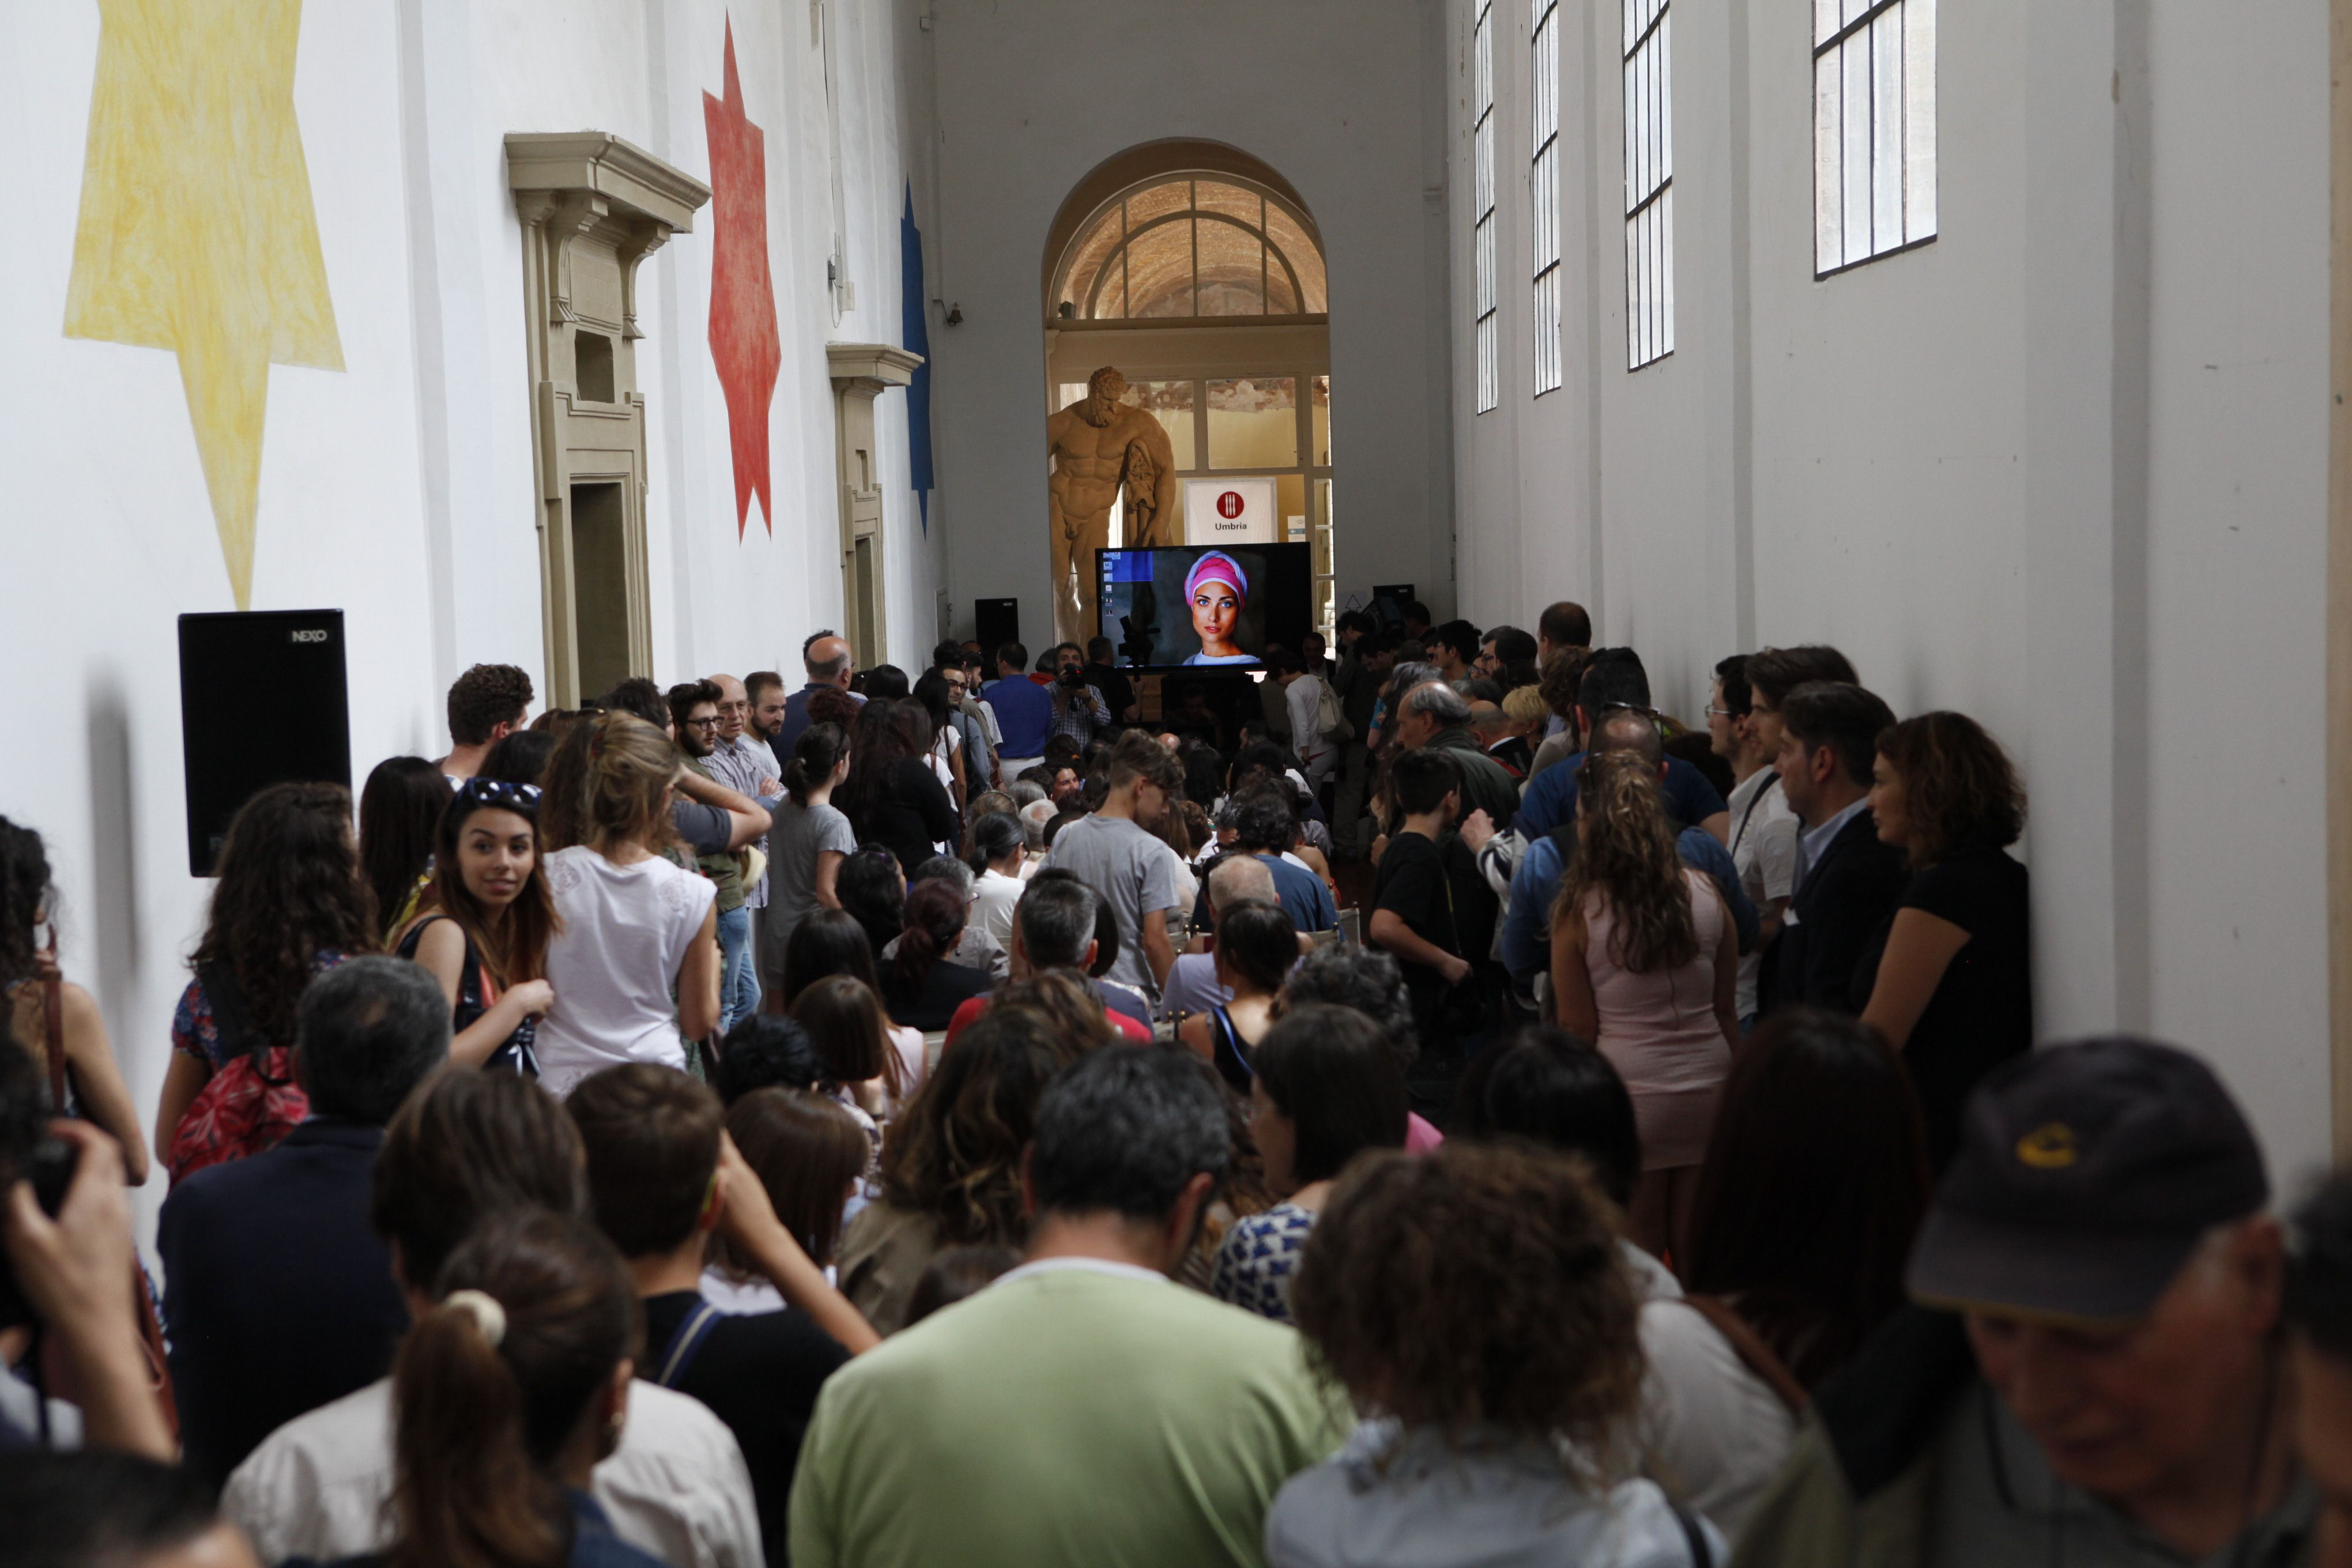 A crowded Accademia di Belle Arti in Perugia is waiting for Steve McCurry #McCurry #SensationalUmbria #SU14 #Perugia #mostra #Fotografia #Photography #exhibition #Umbria #Accademia #arti